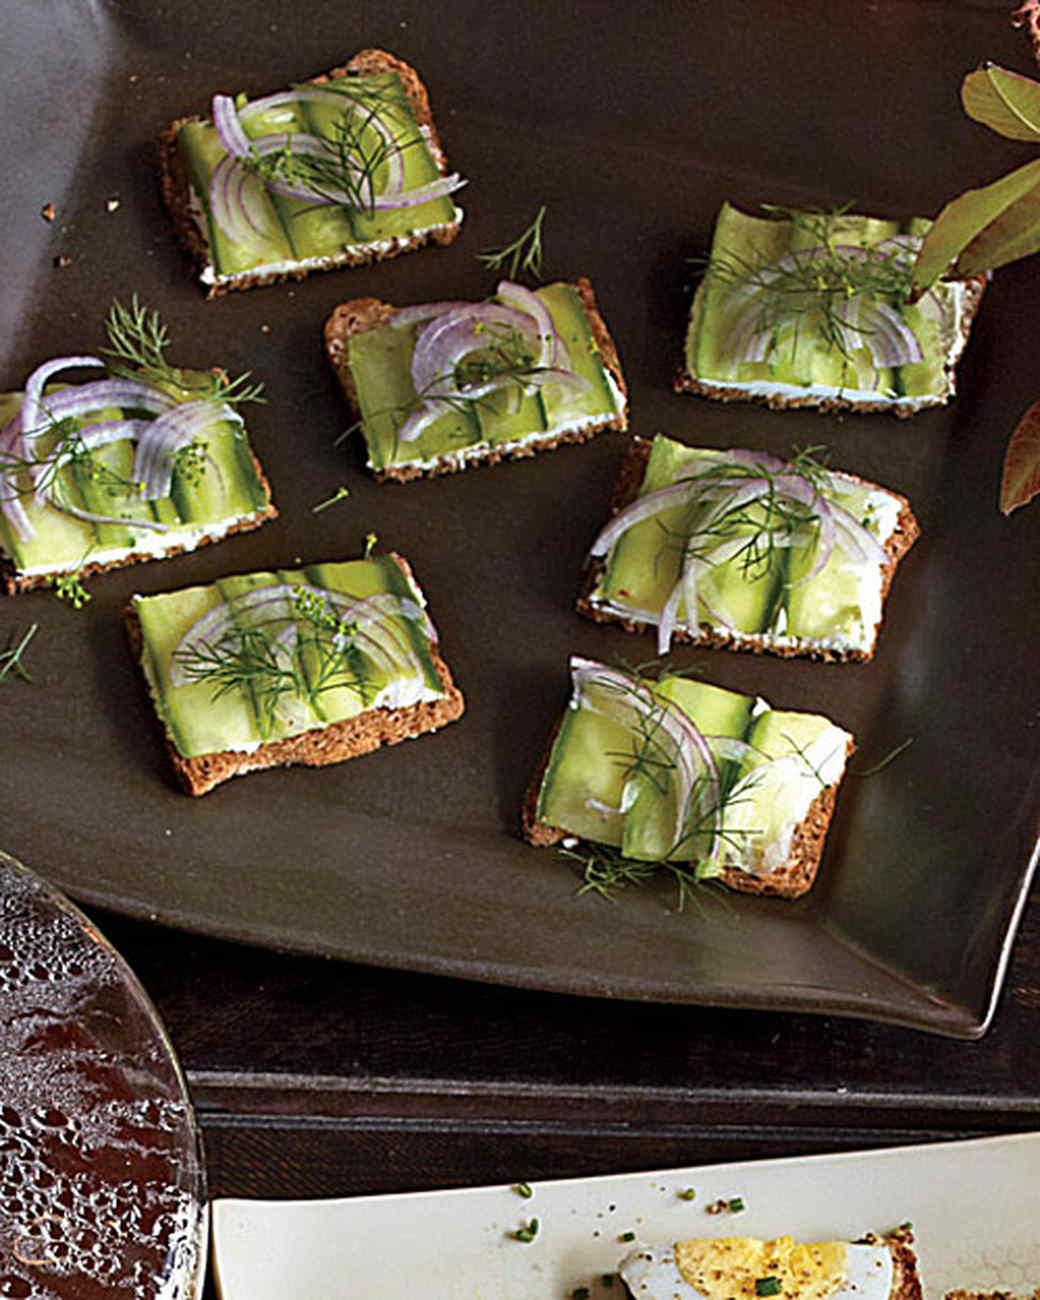 goat-cheese-cucumber-mbd108014.jpg